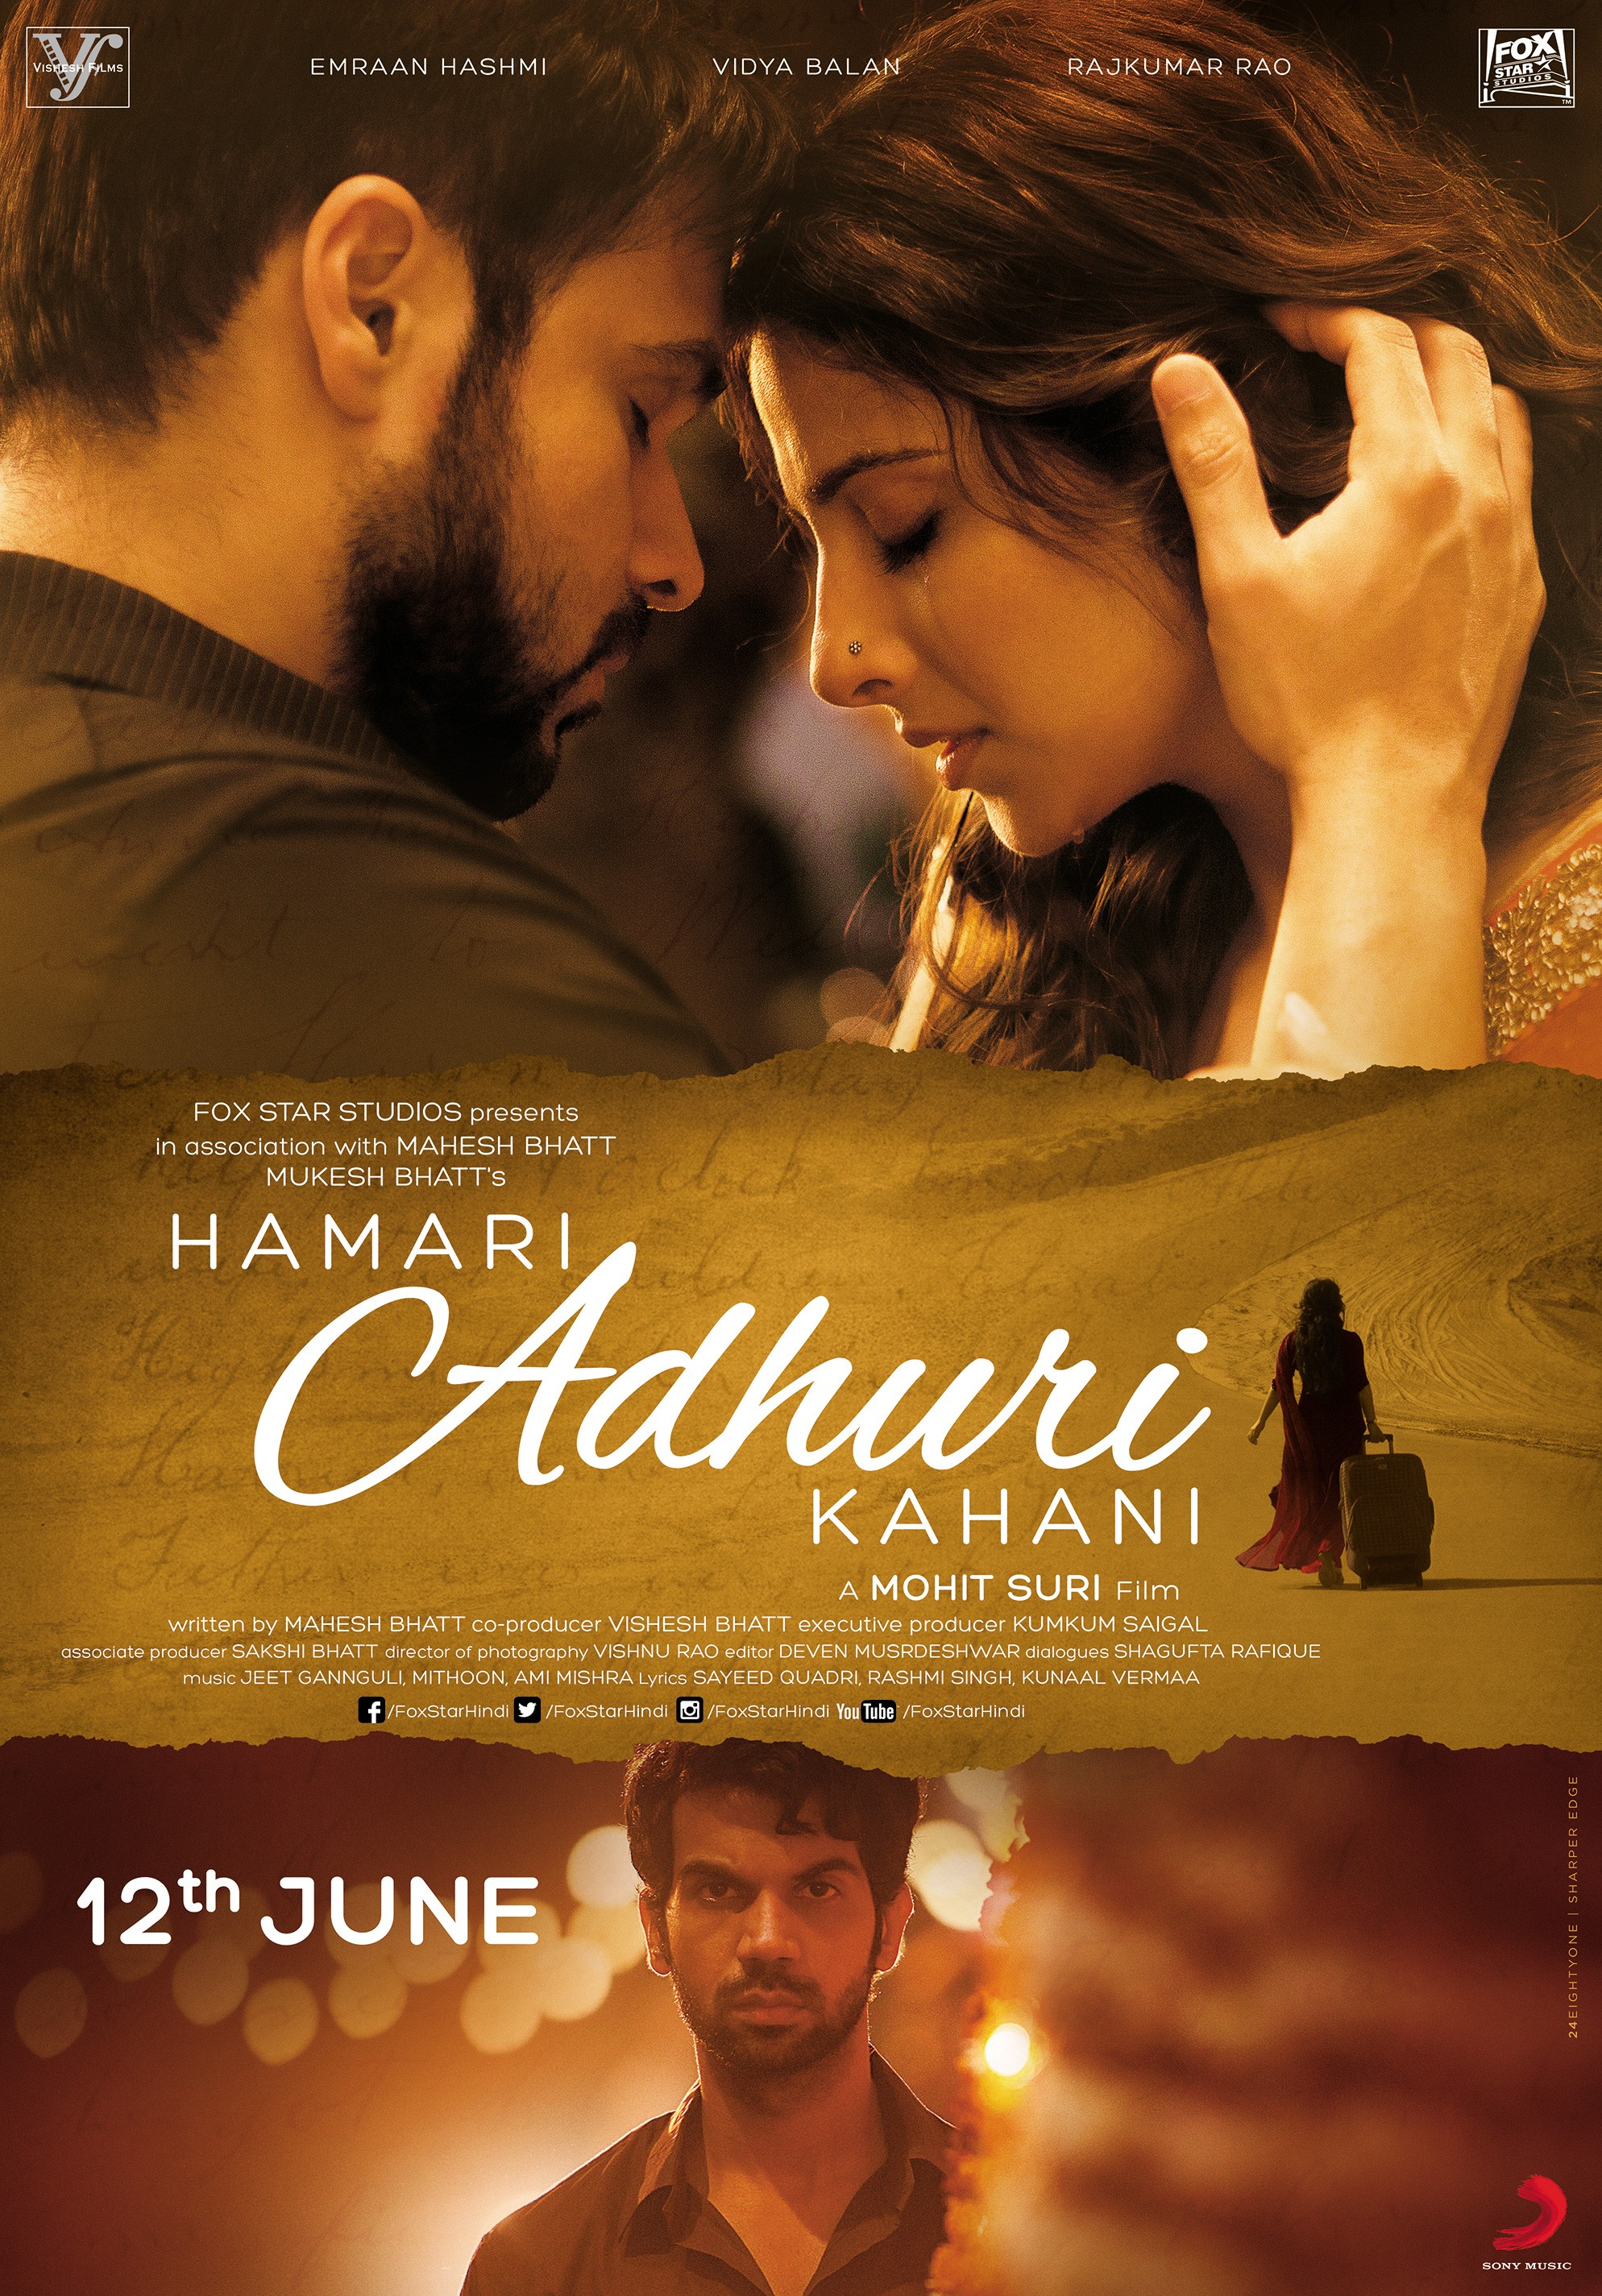 Hamari Adhuri Kahani 2015 Imdb